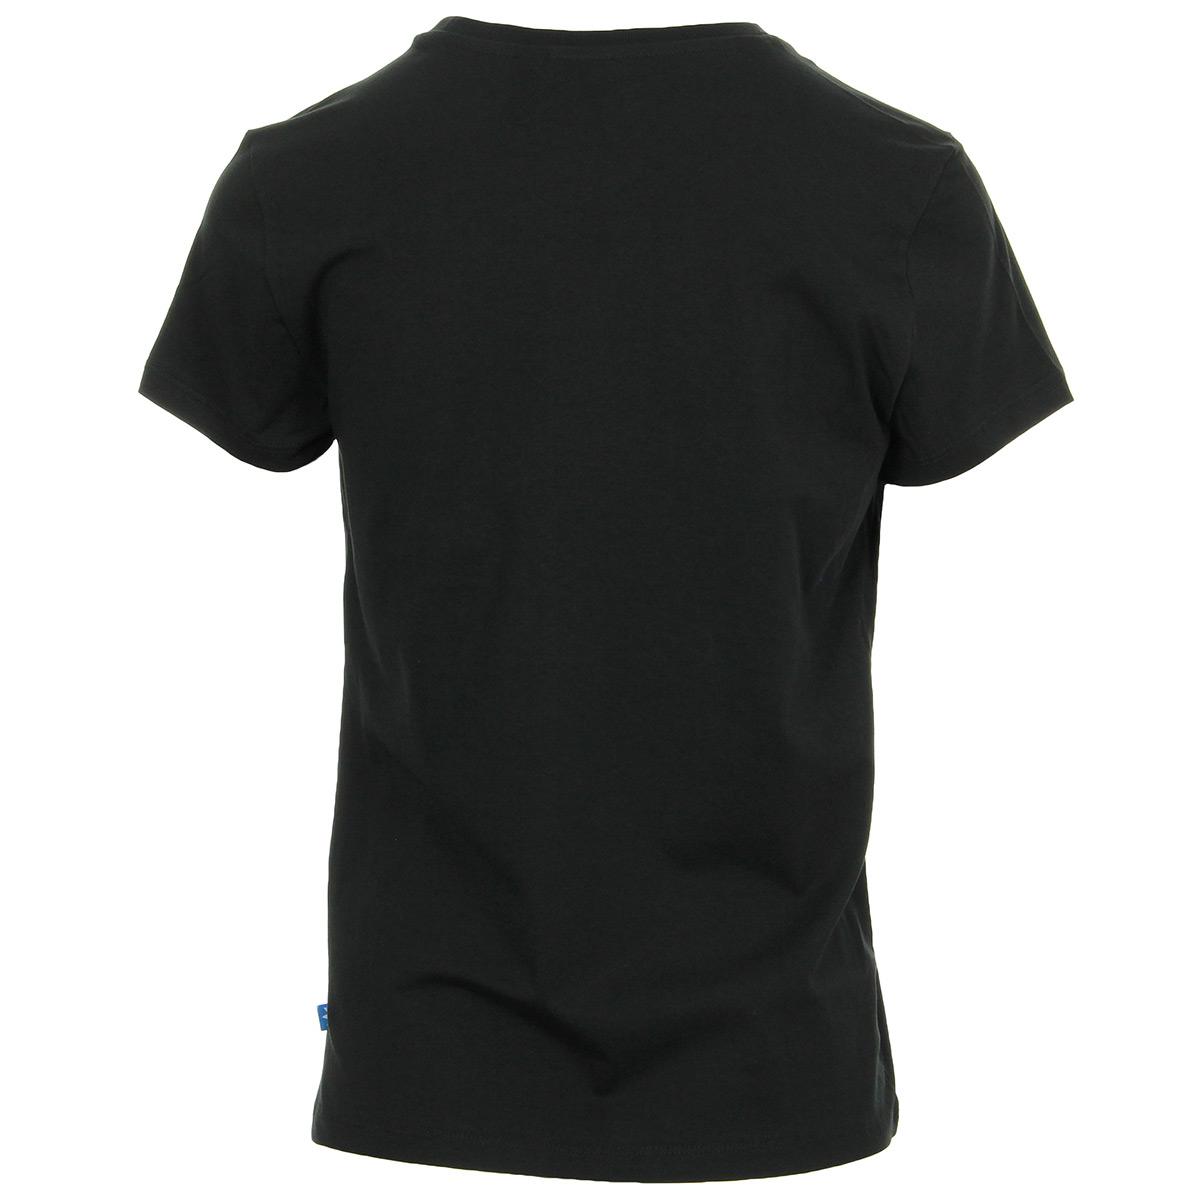 adidas Trefoil Tee AJ8084, T-Shirts femme